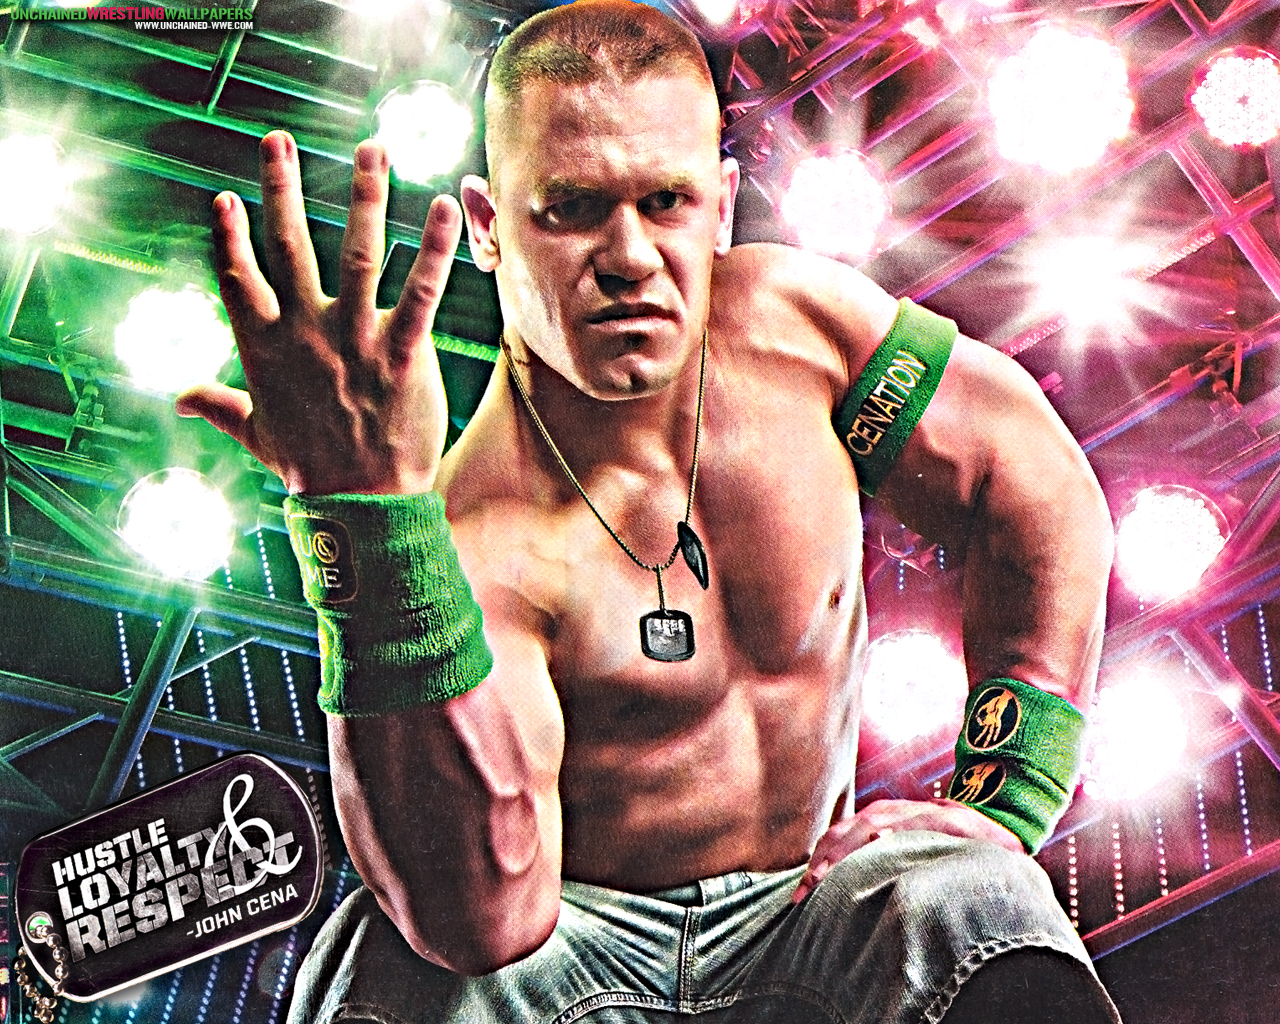 Wwe Superstar John Cena Wallpapers Wwe Superstars Wwe Wallpapers